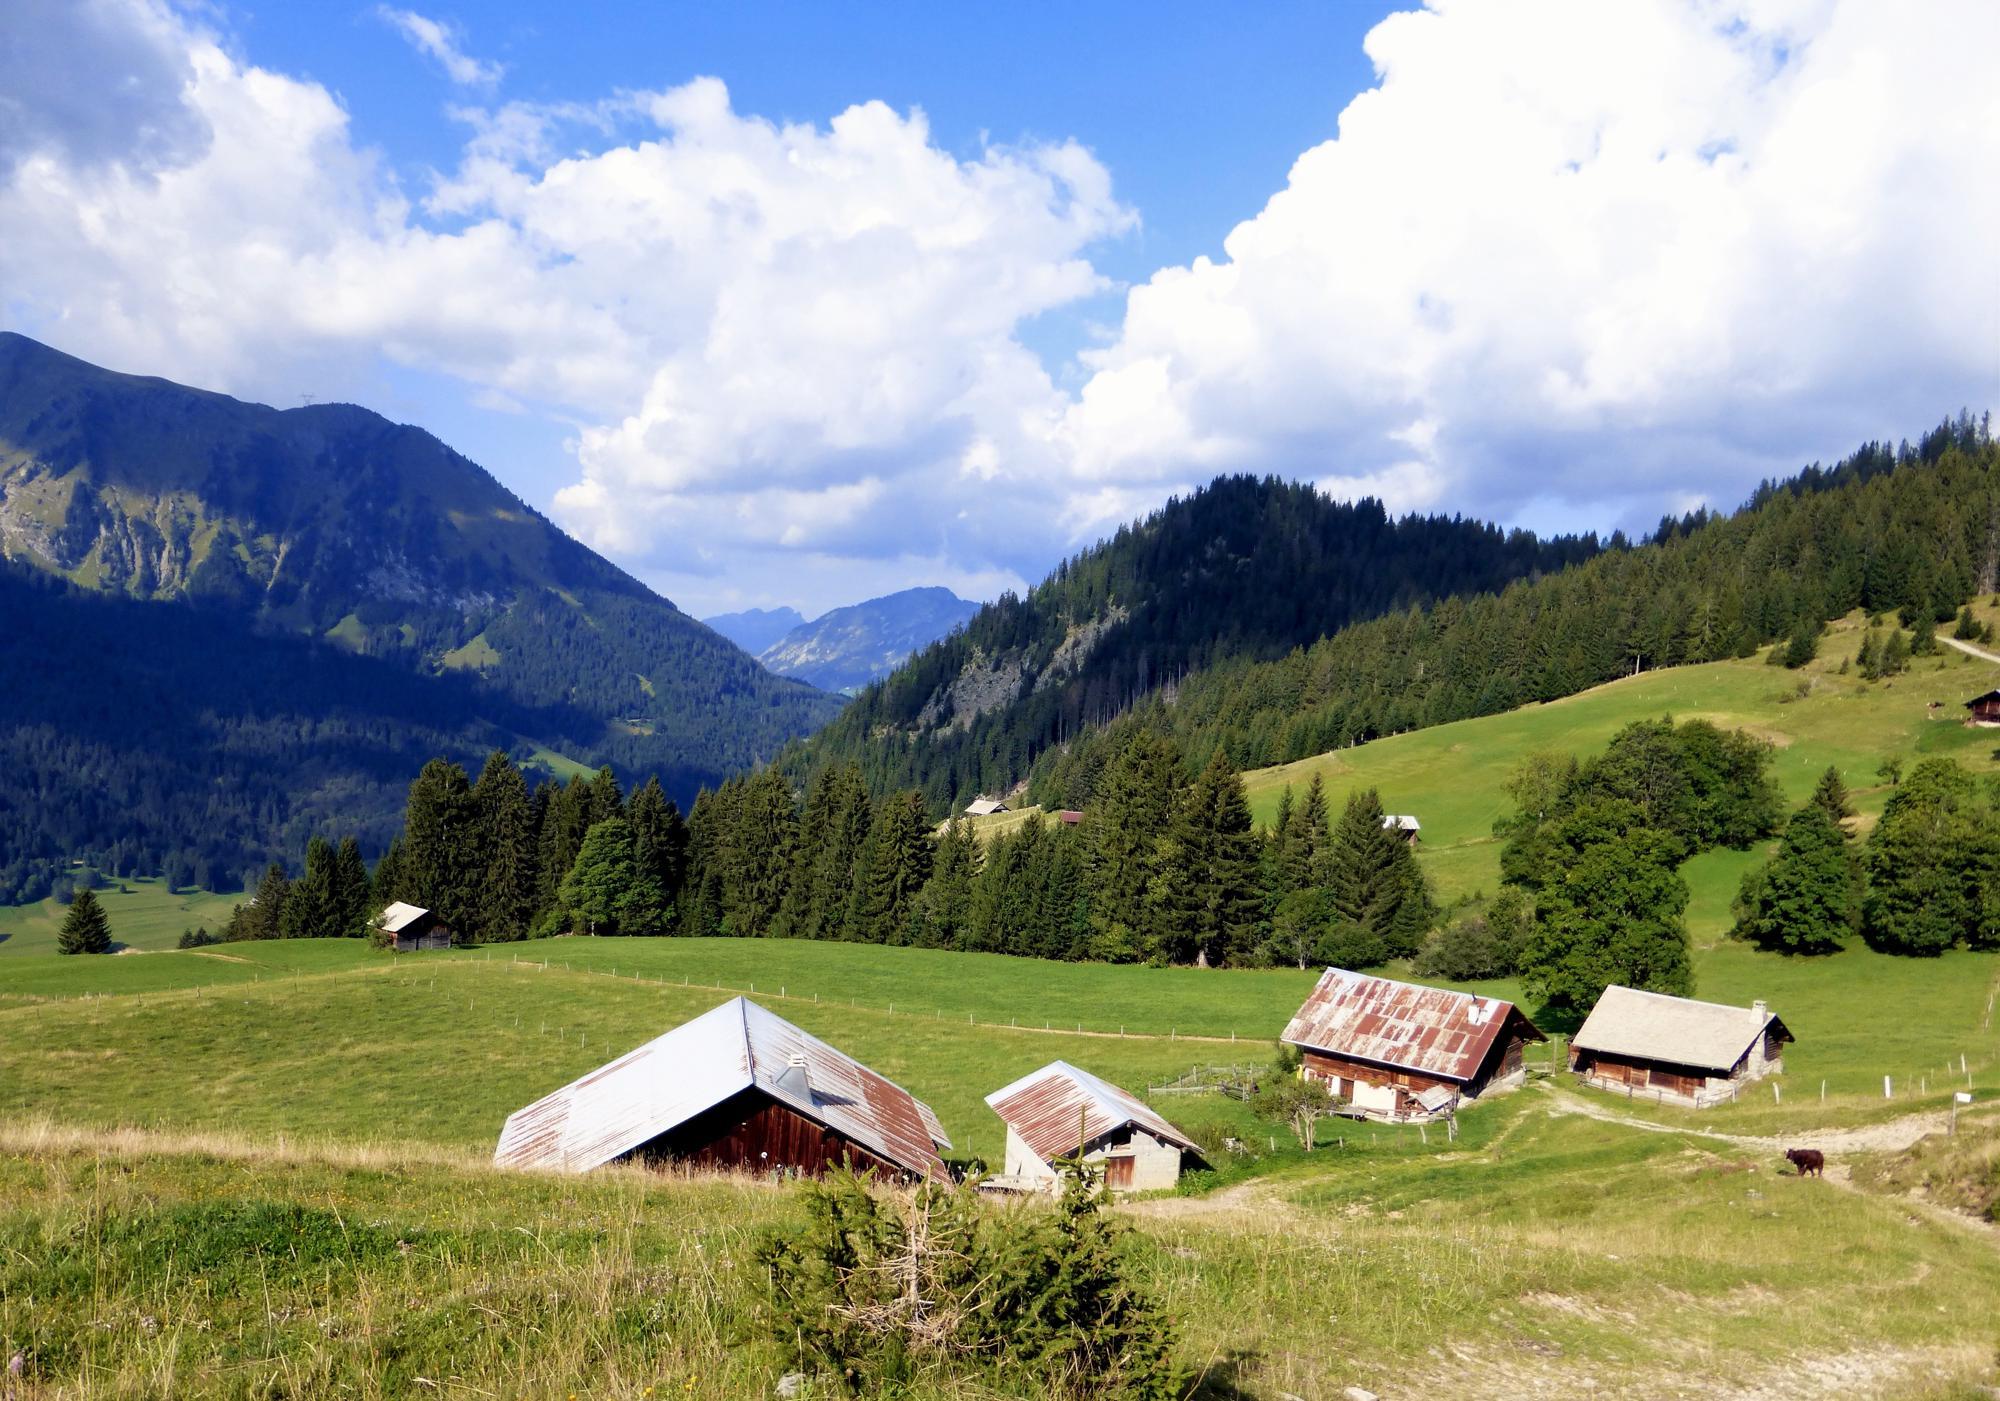 Glamping in Savoie | Best Glamping Sites in Savoie